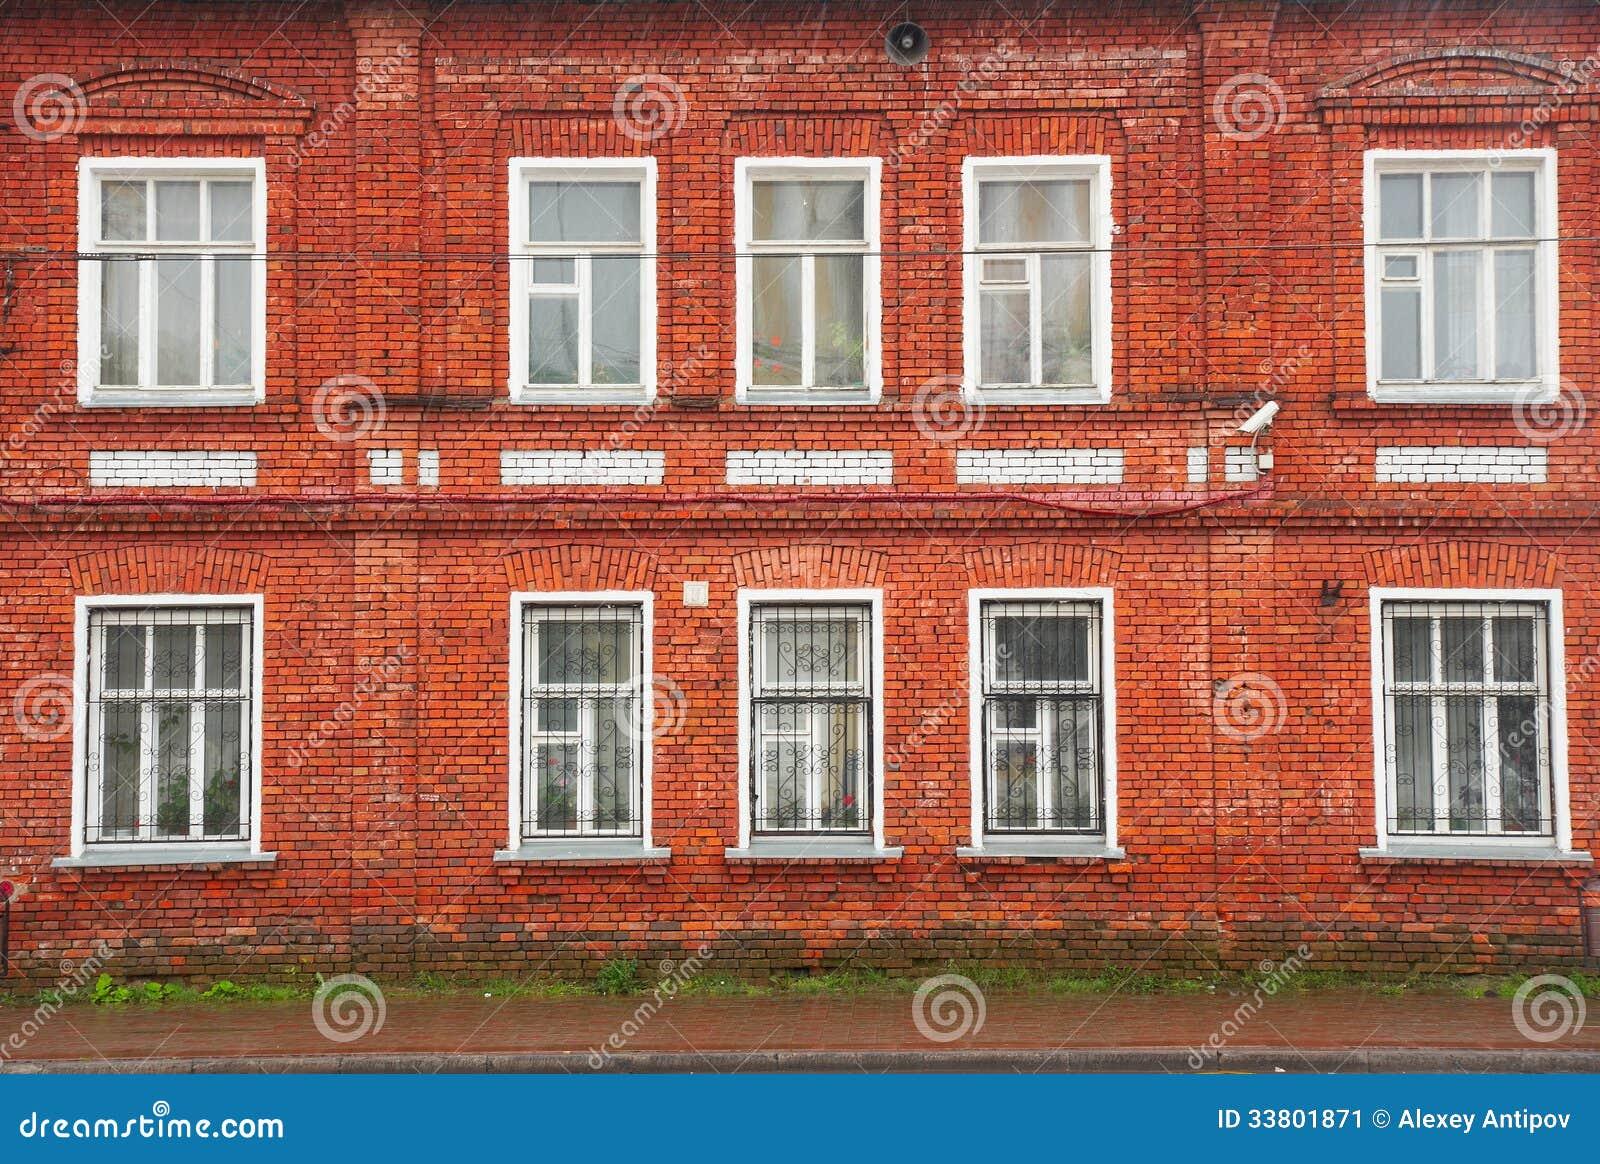 Fa ade de vieille maison de brique rouge image stock for Brique facade maison